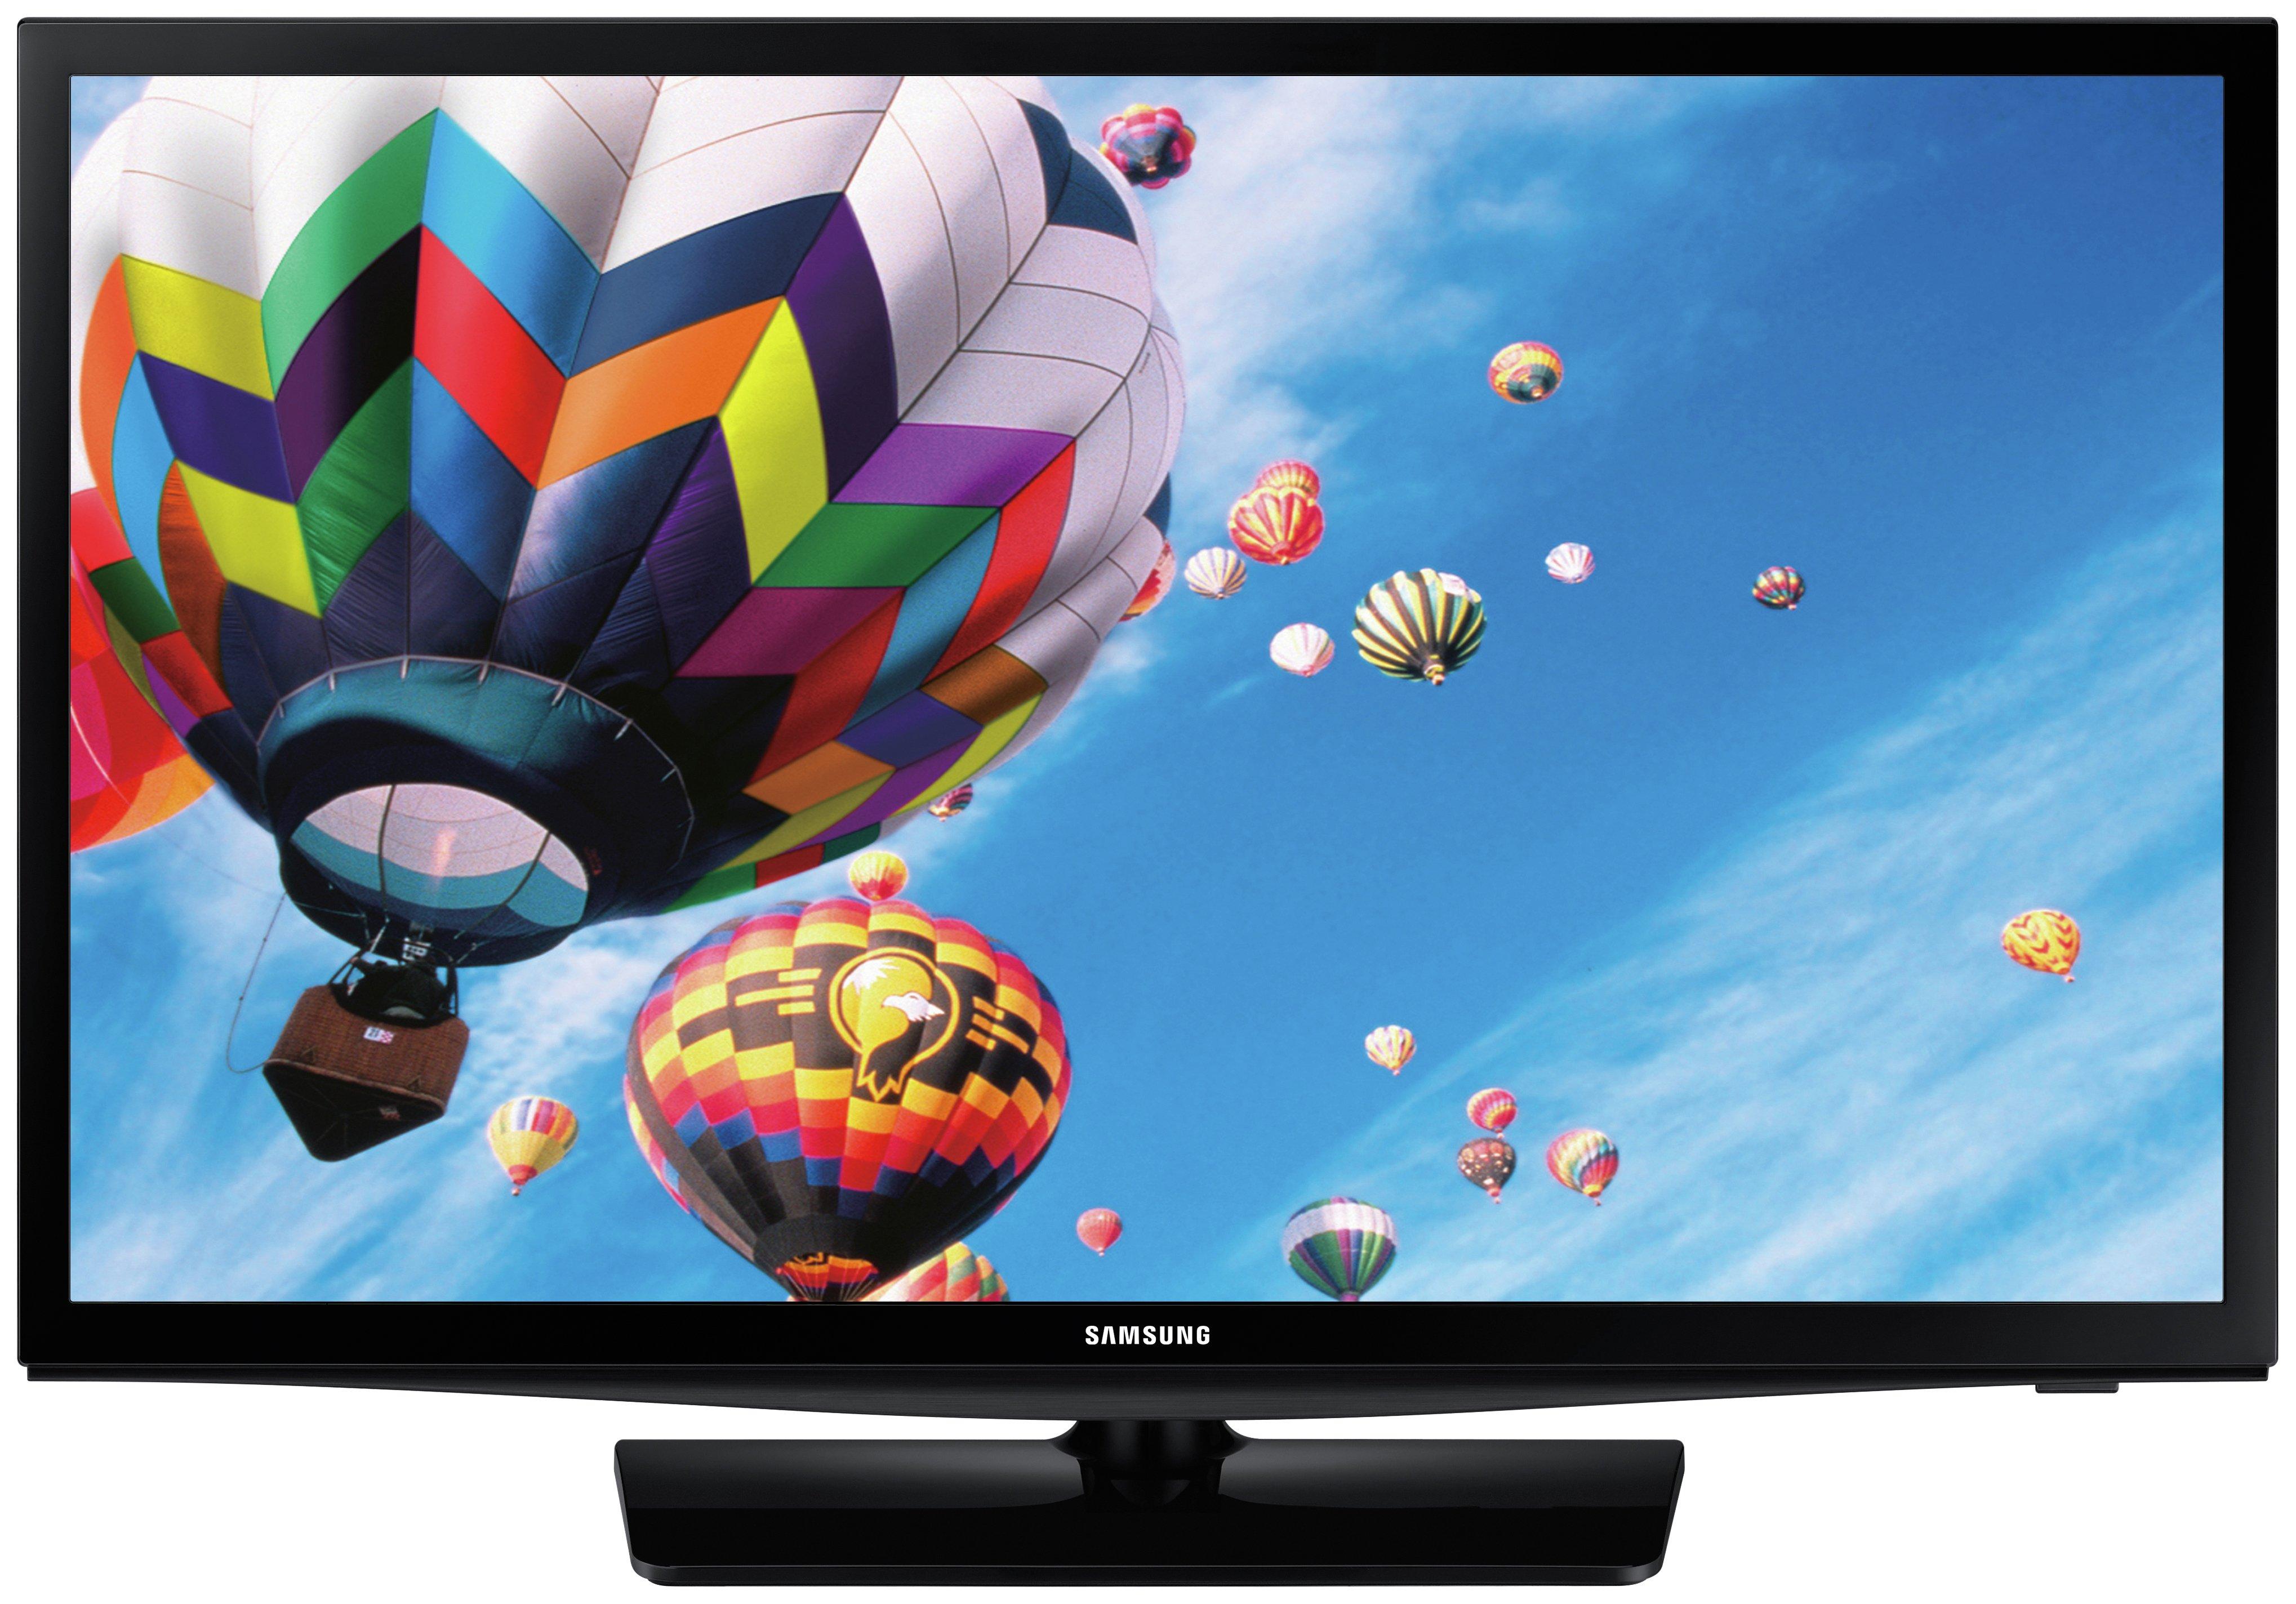 samsung tv 38 inch. samsung ue24h4003awxxu 24 inch hd ready tv tv 38